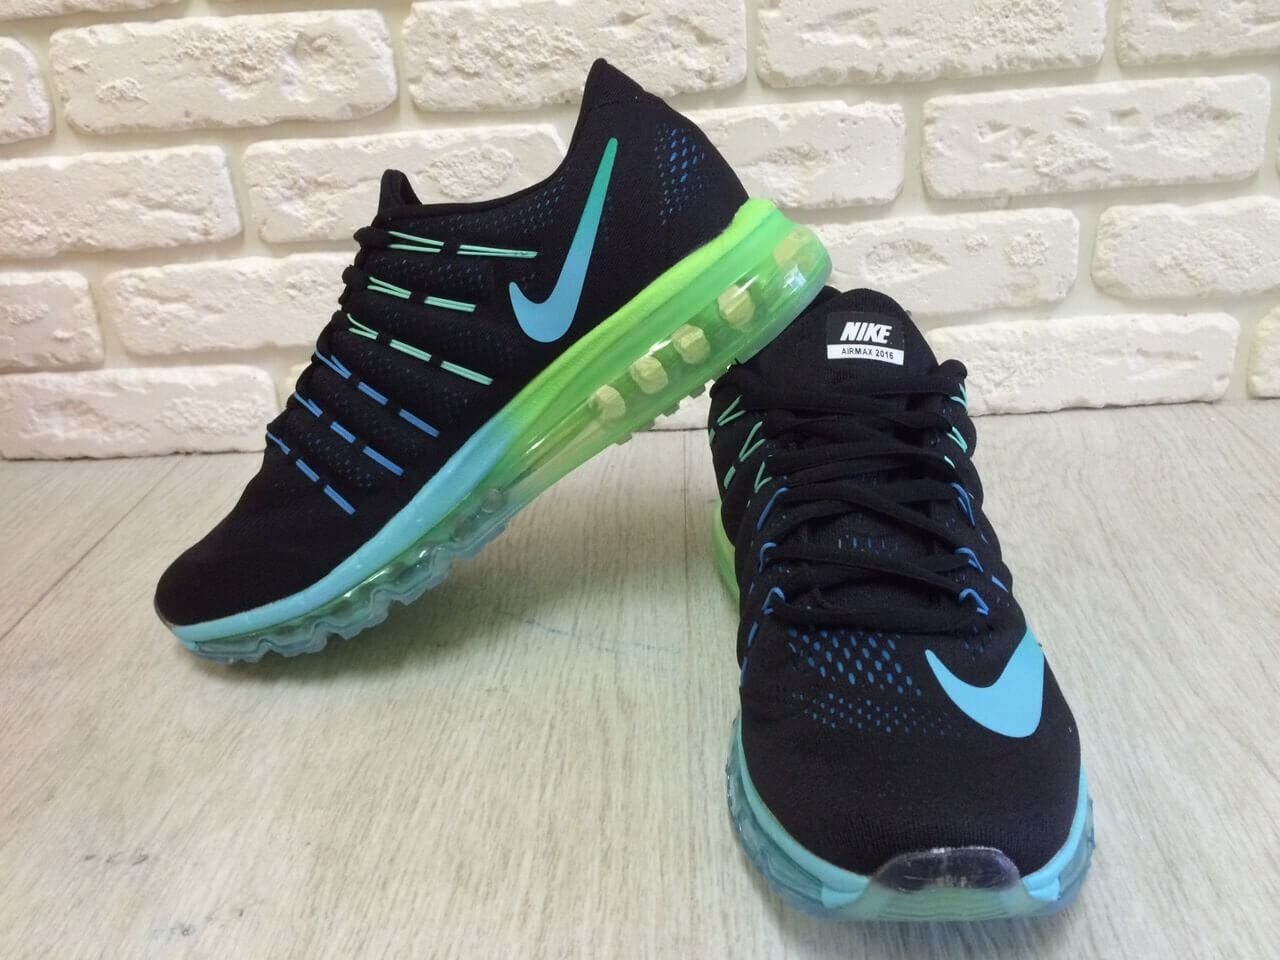 9926e51d6 Мужские кроссовки Nike Air Max 2016 Black/Blue/Green топ реплика - Интернет-